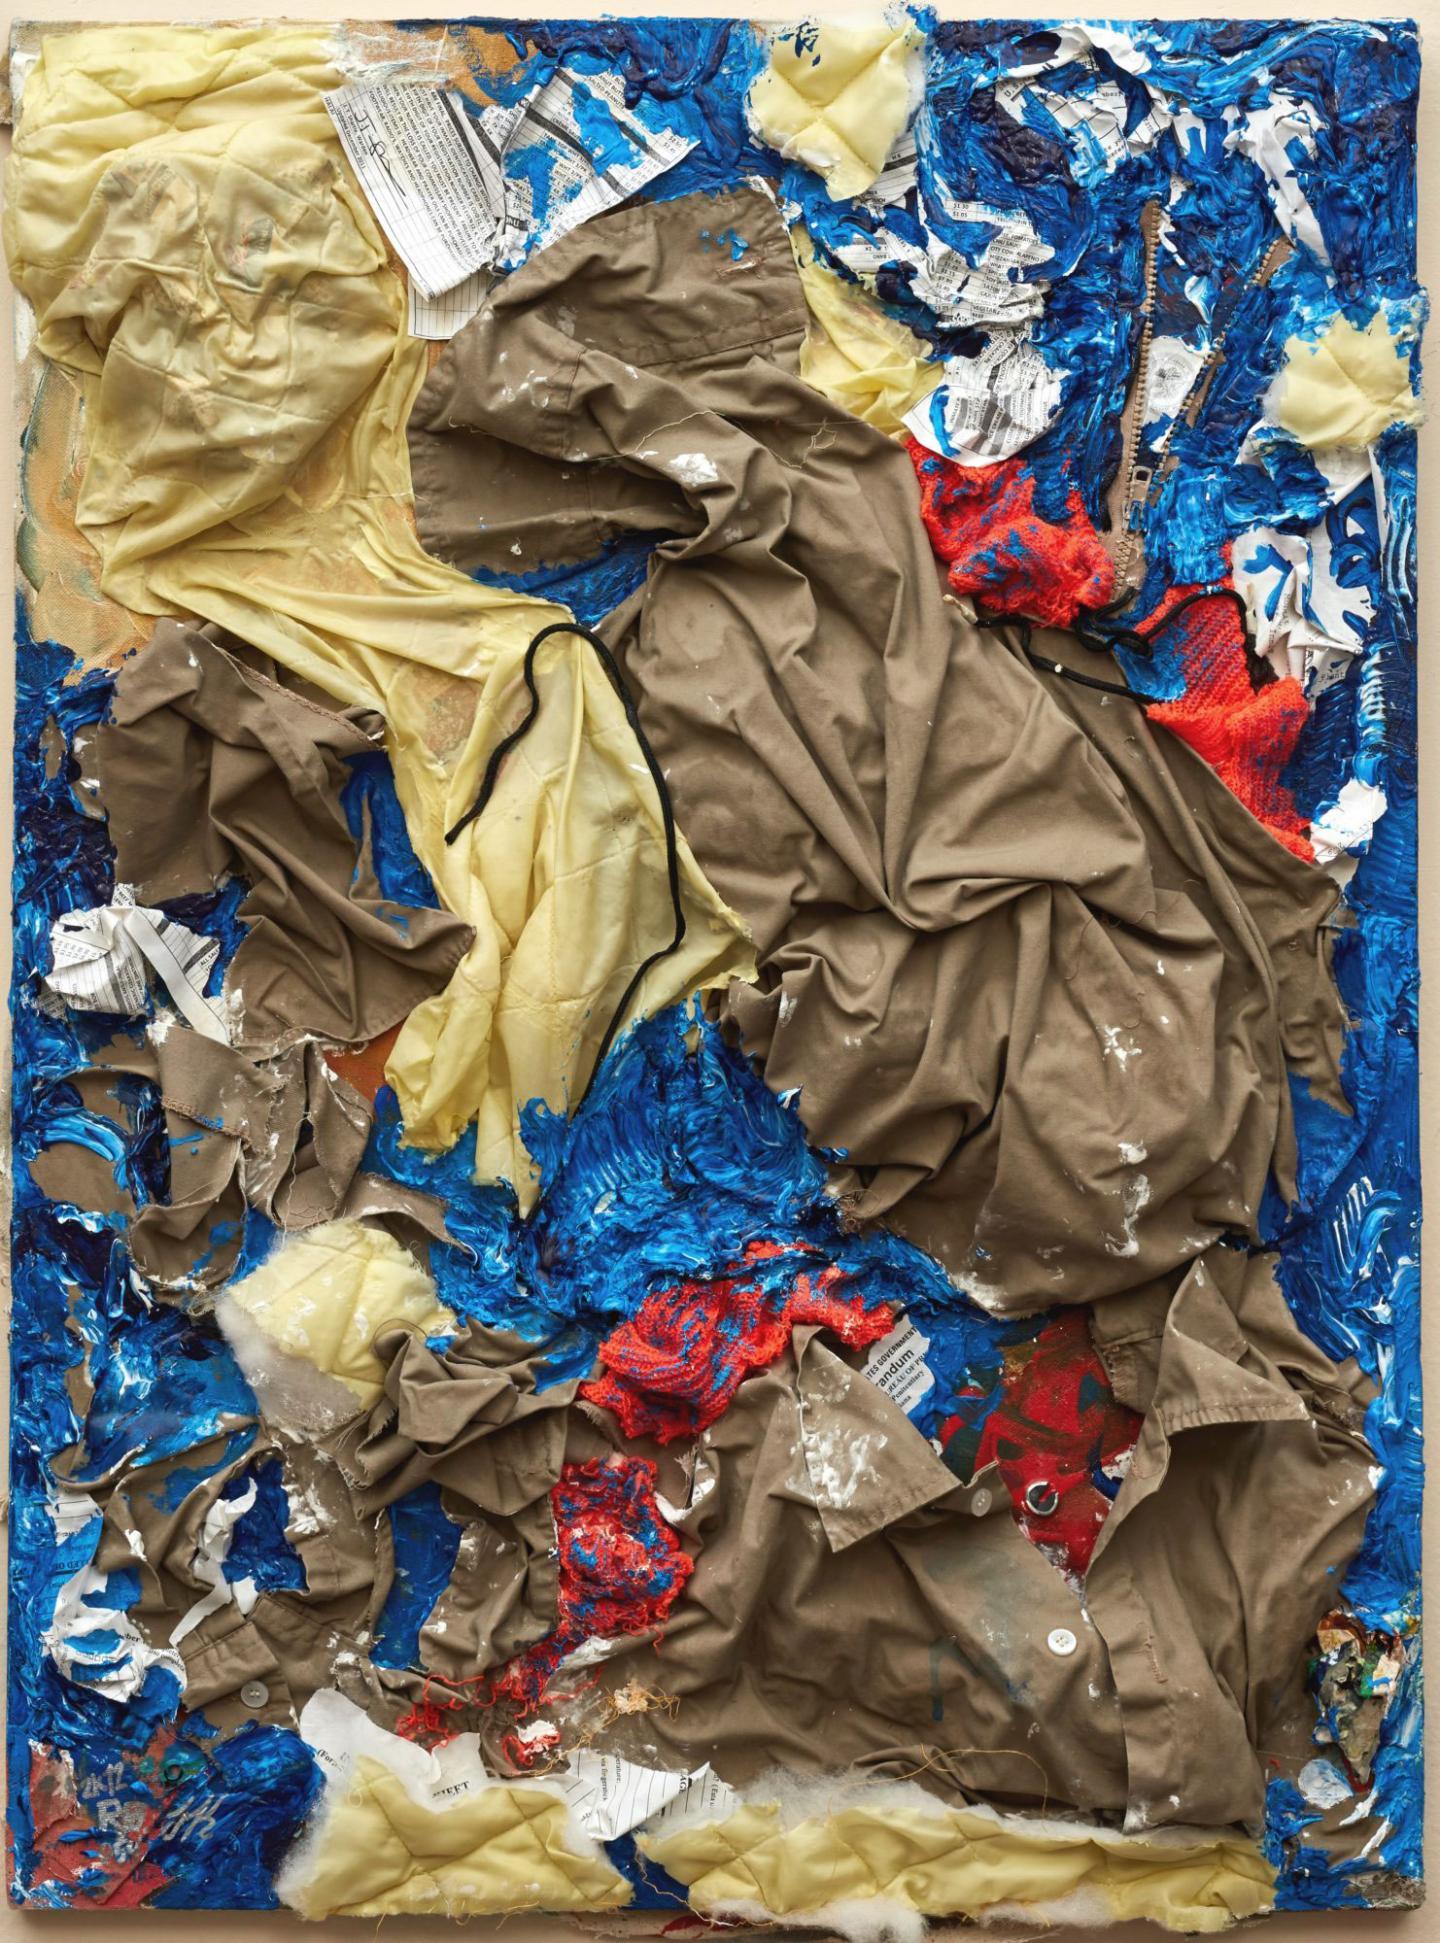 Gilberto Rivera, An Institutional Nightmare, 2012